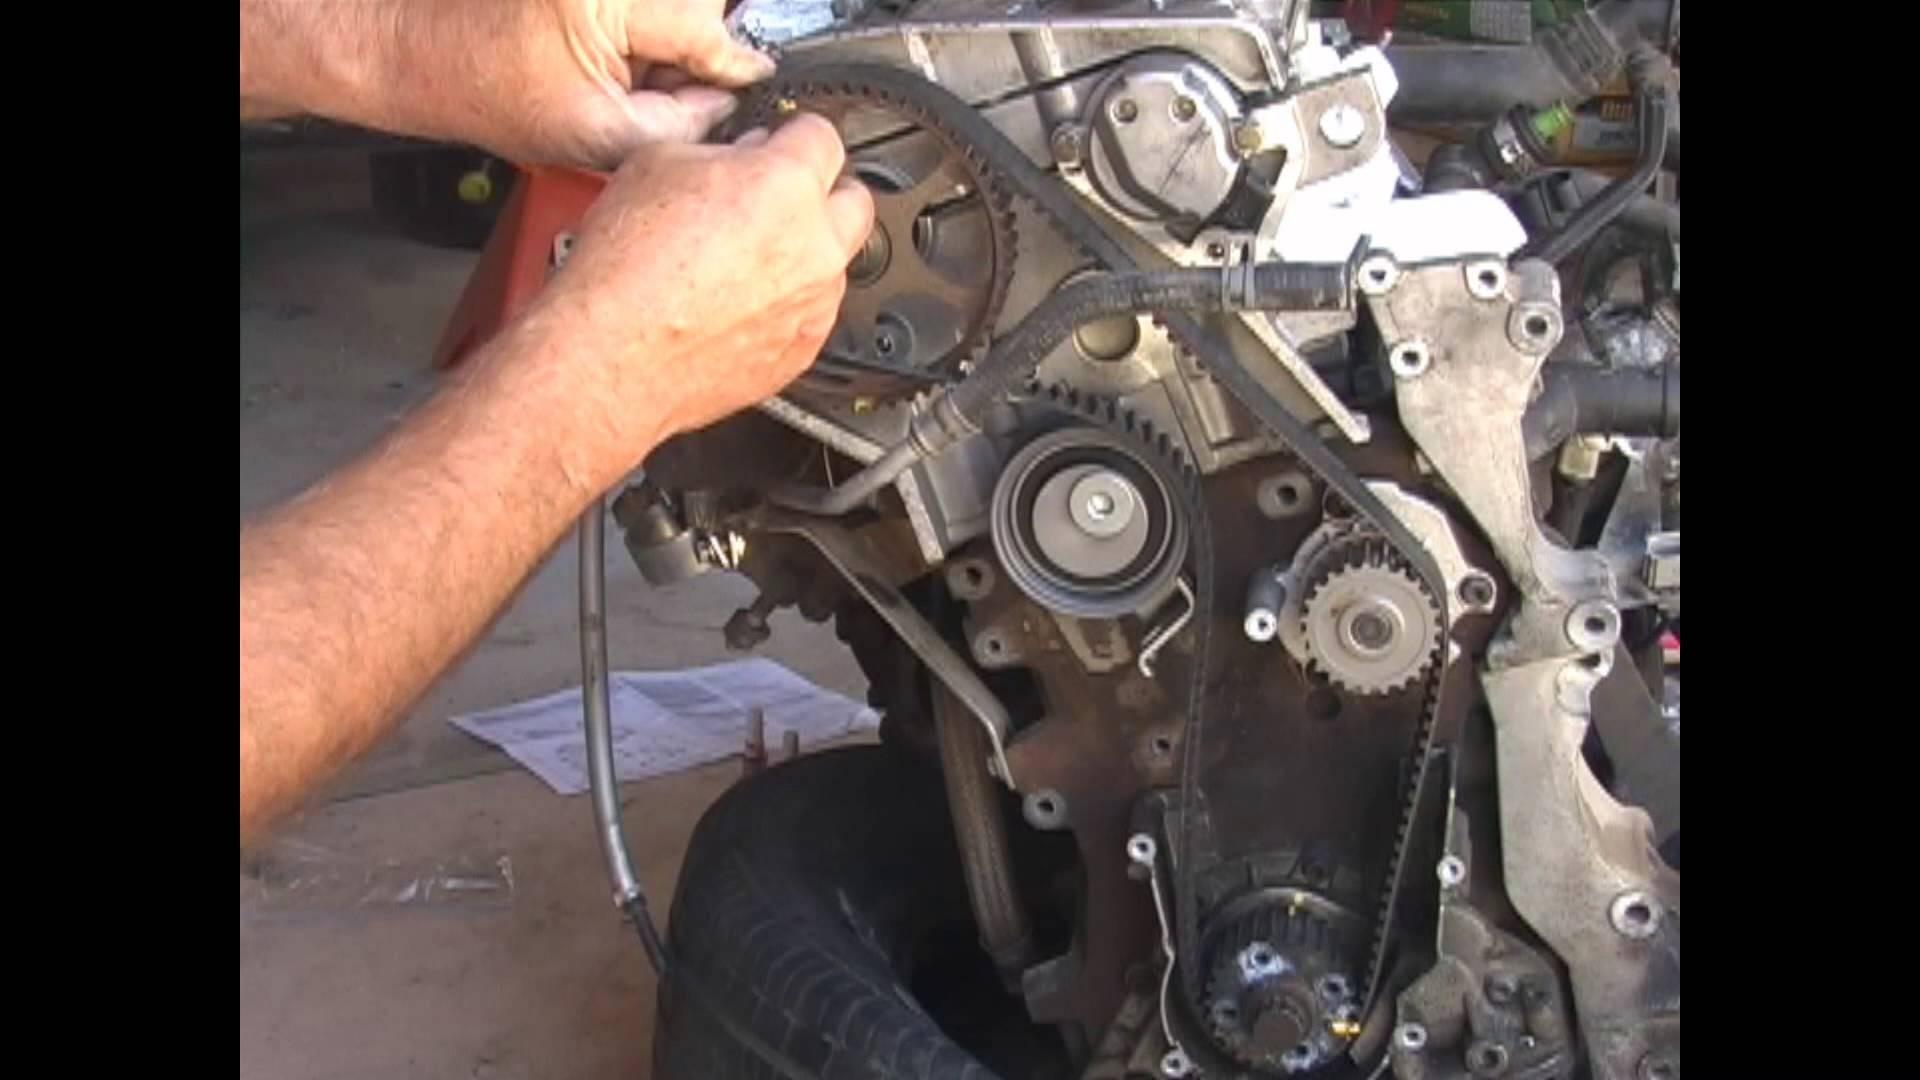 2001 Vw Beetle Turbo Engine Diagram Audi 1 8 Timing Belt Setting Diagrams Replacement